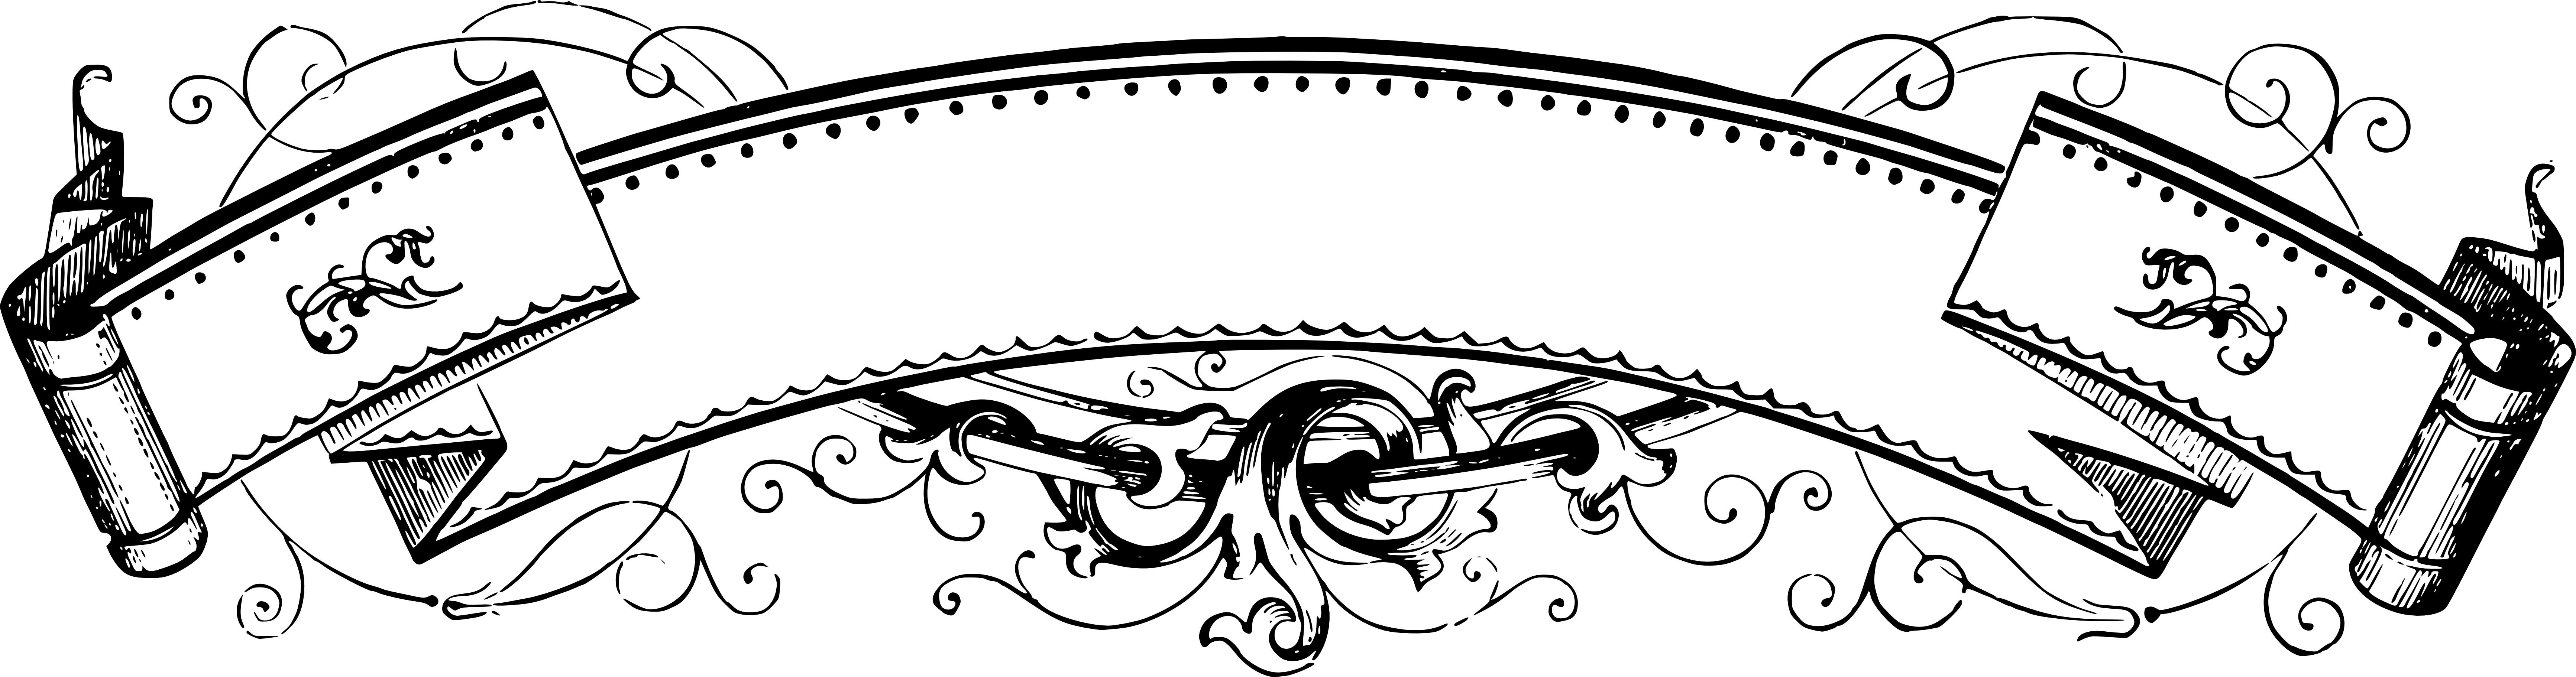 Free Ribbon Vector Vintage Png, Download Free Clip Art, Free.